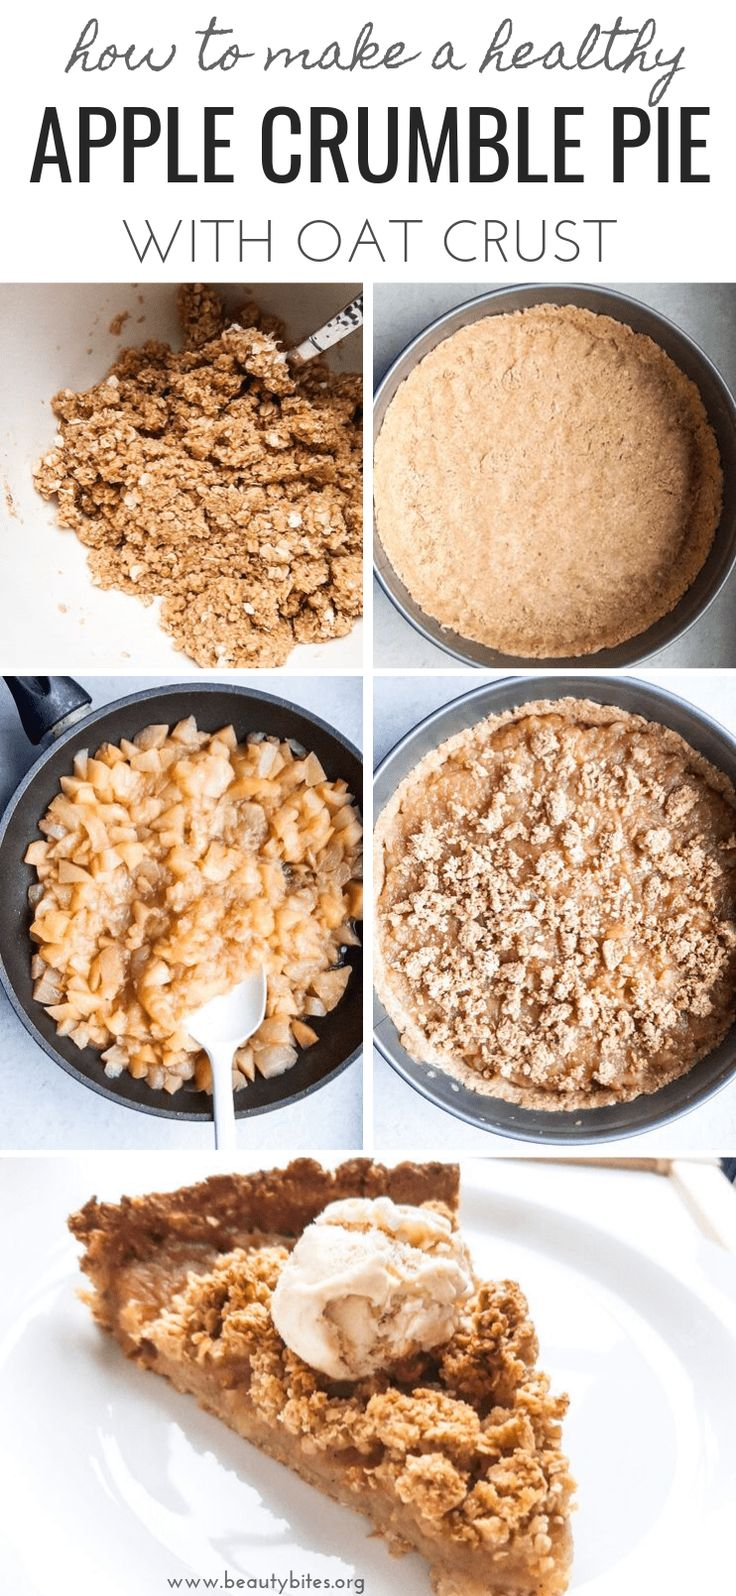 Healthy Apple Crumble Pie Flourless, Vegan, GF